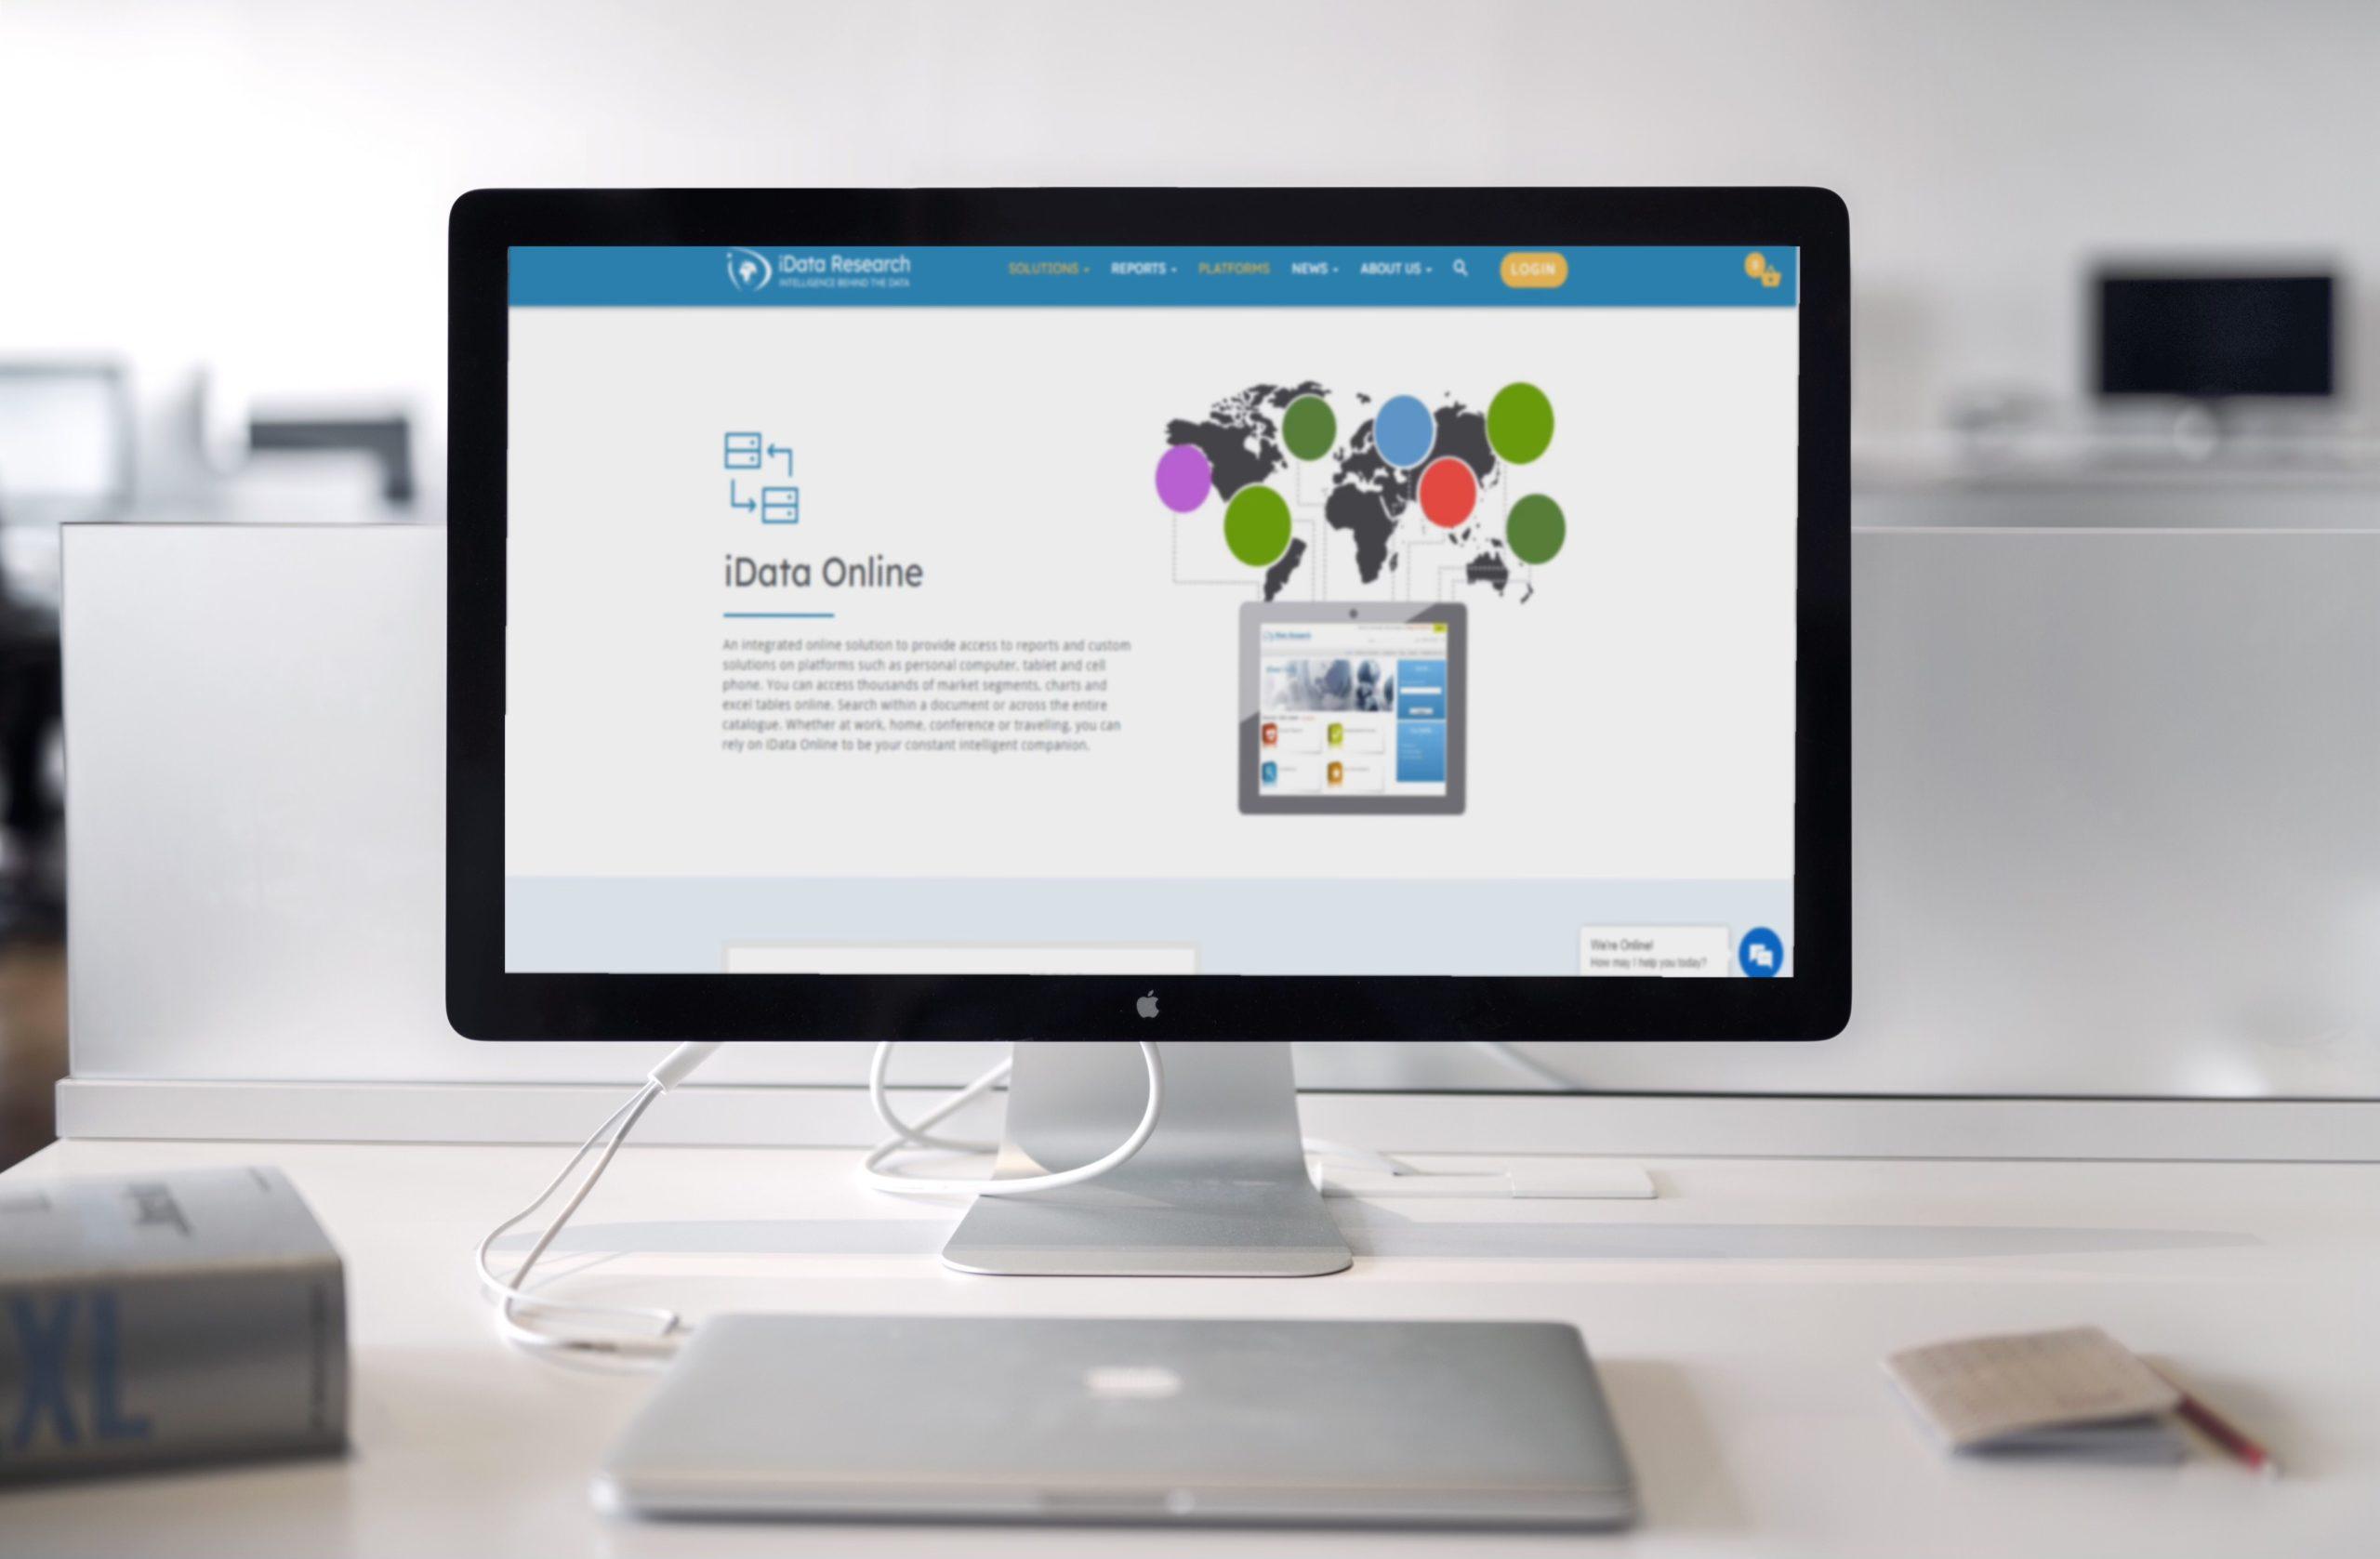 iData Online: Virtual Platform for Medical Device Industry